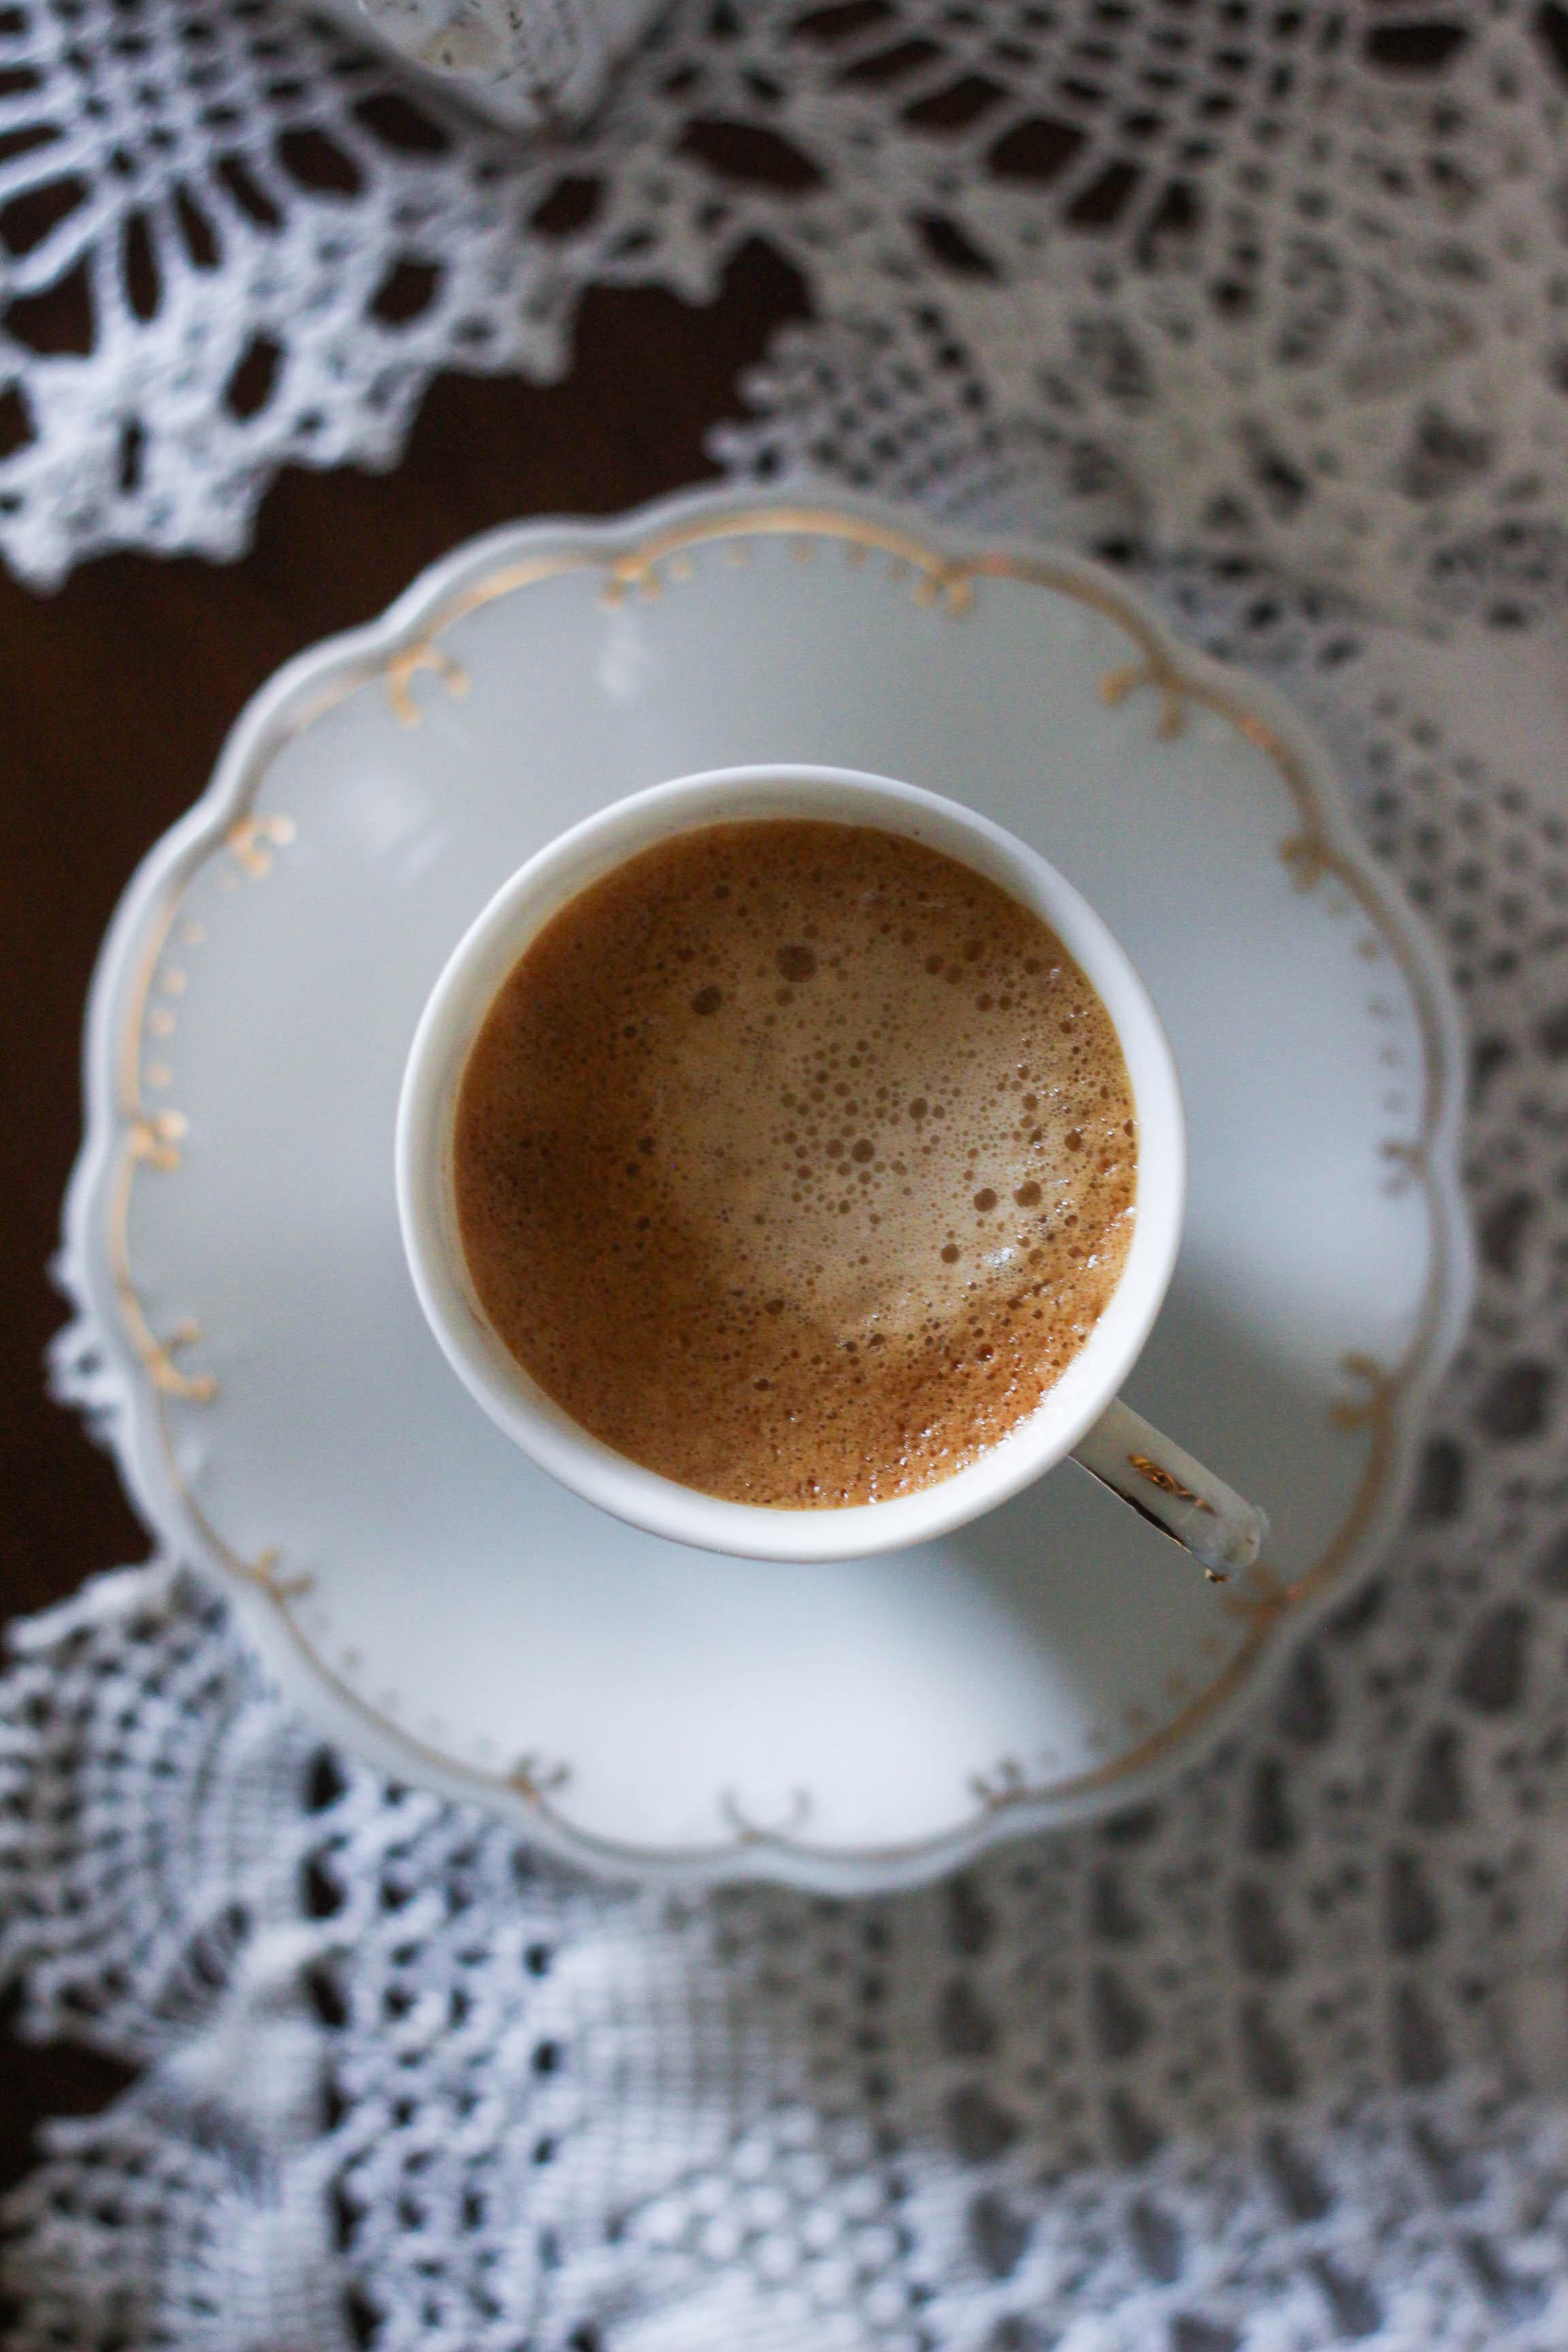 Peet's Espresso Capsules for Nespresso